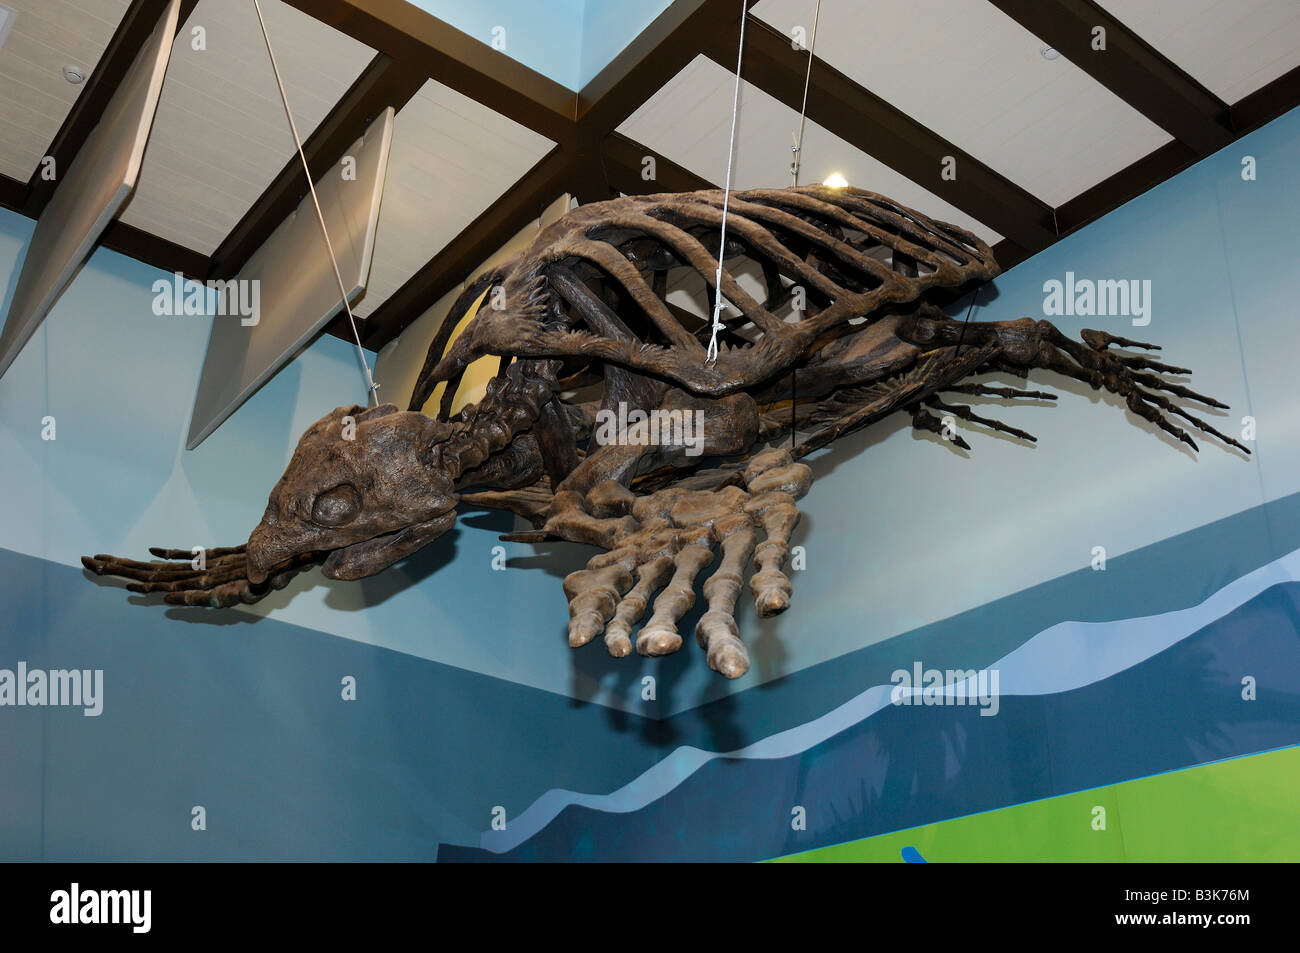 Archelon antiguo esqueleto de tortugas marinas desde el período Cretácico Florida Foto de stock